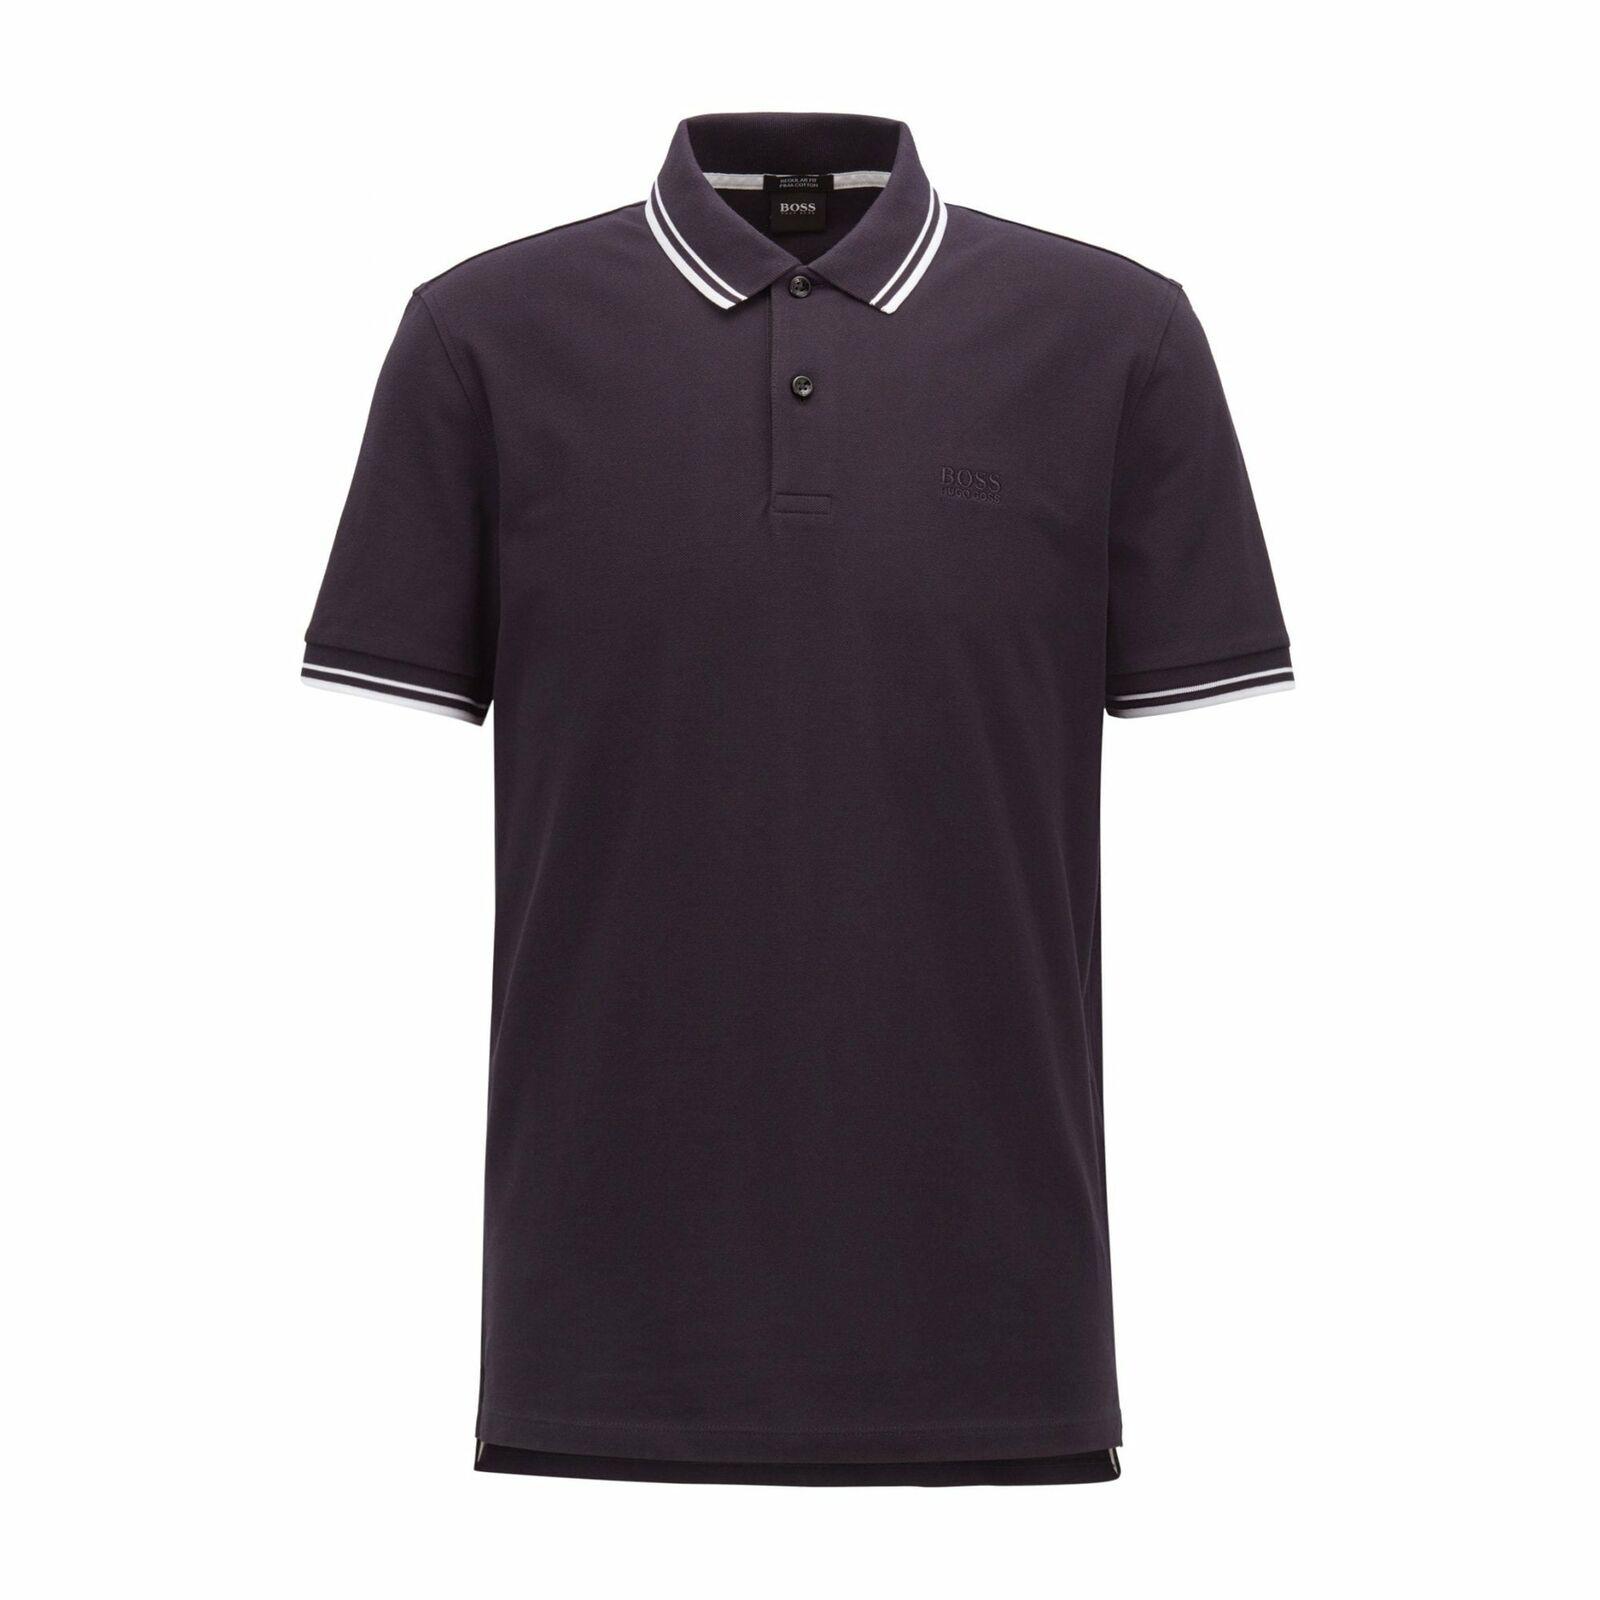 Hugo Boss pourparlers 16 Manches Courtes Coton Bleu Marine Polo Shirt